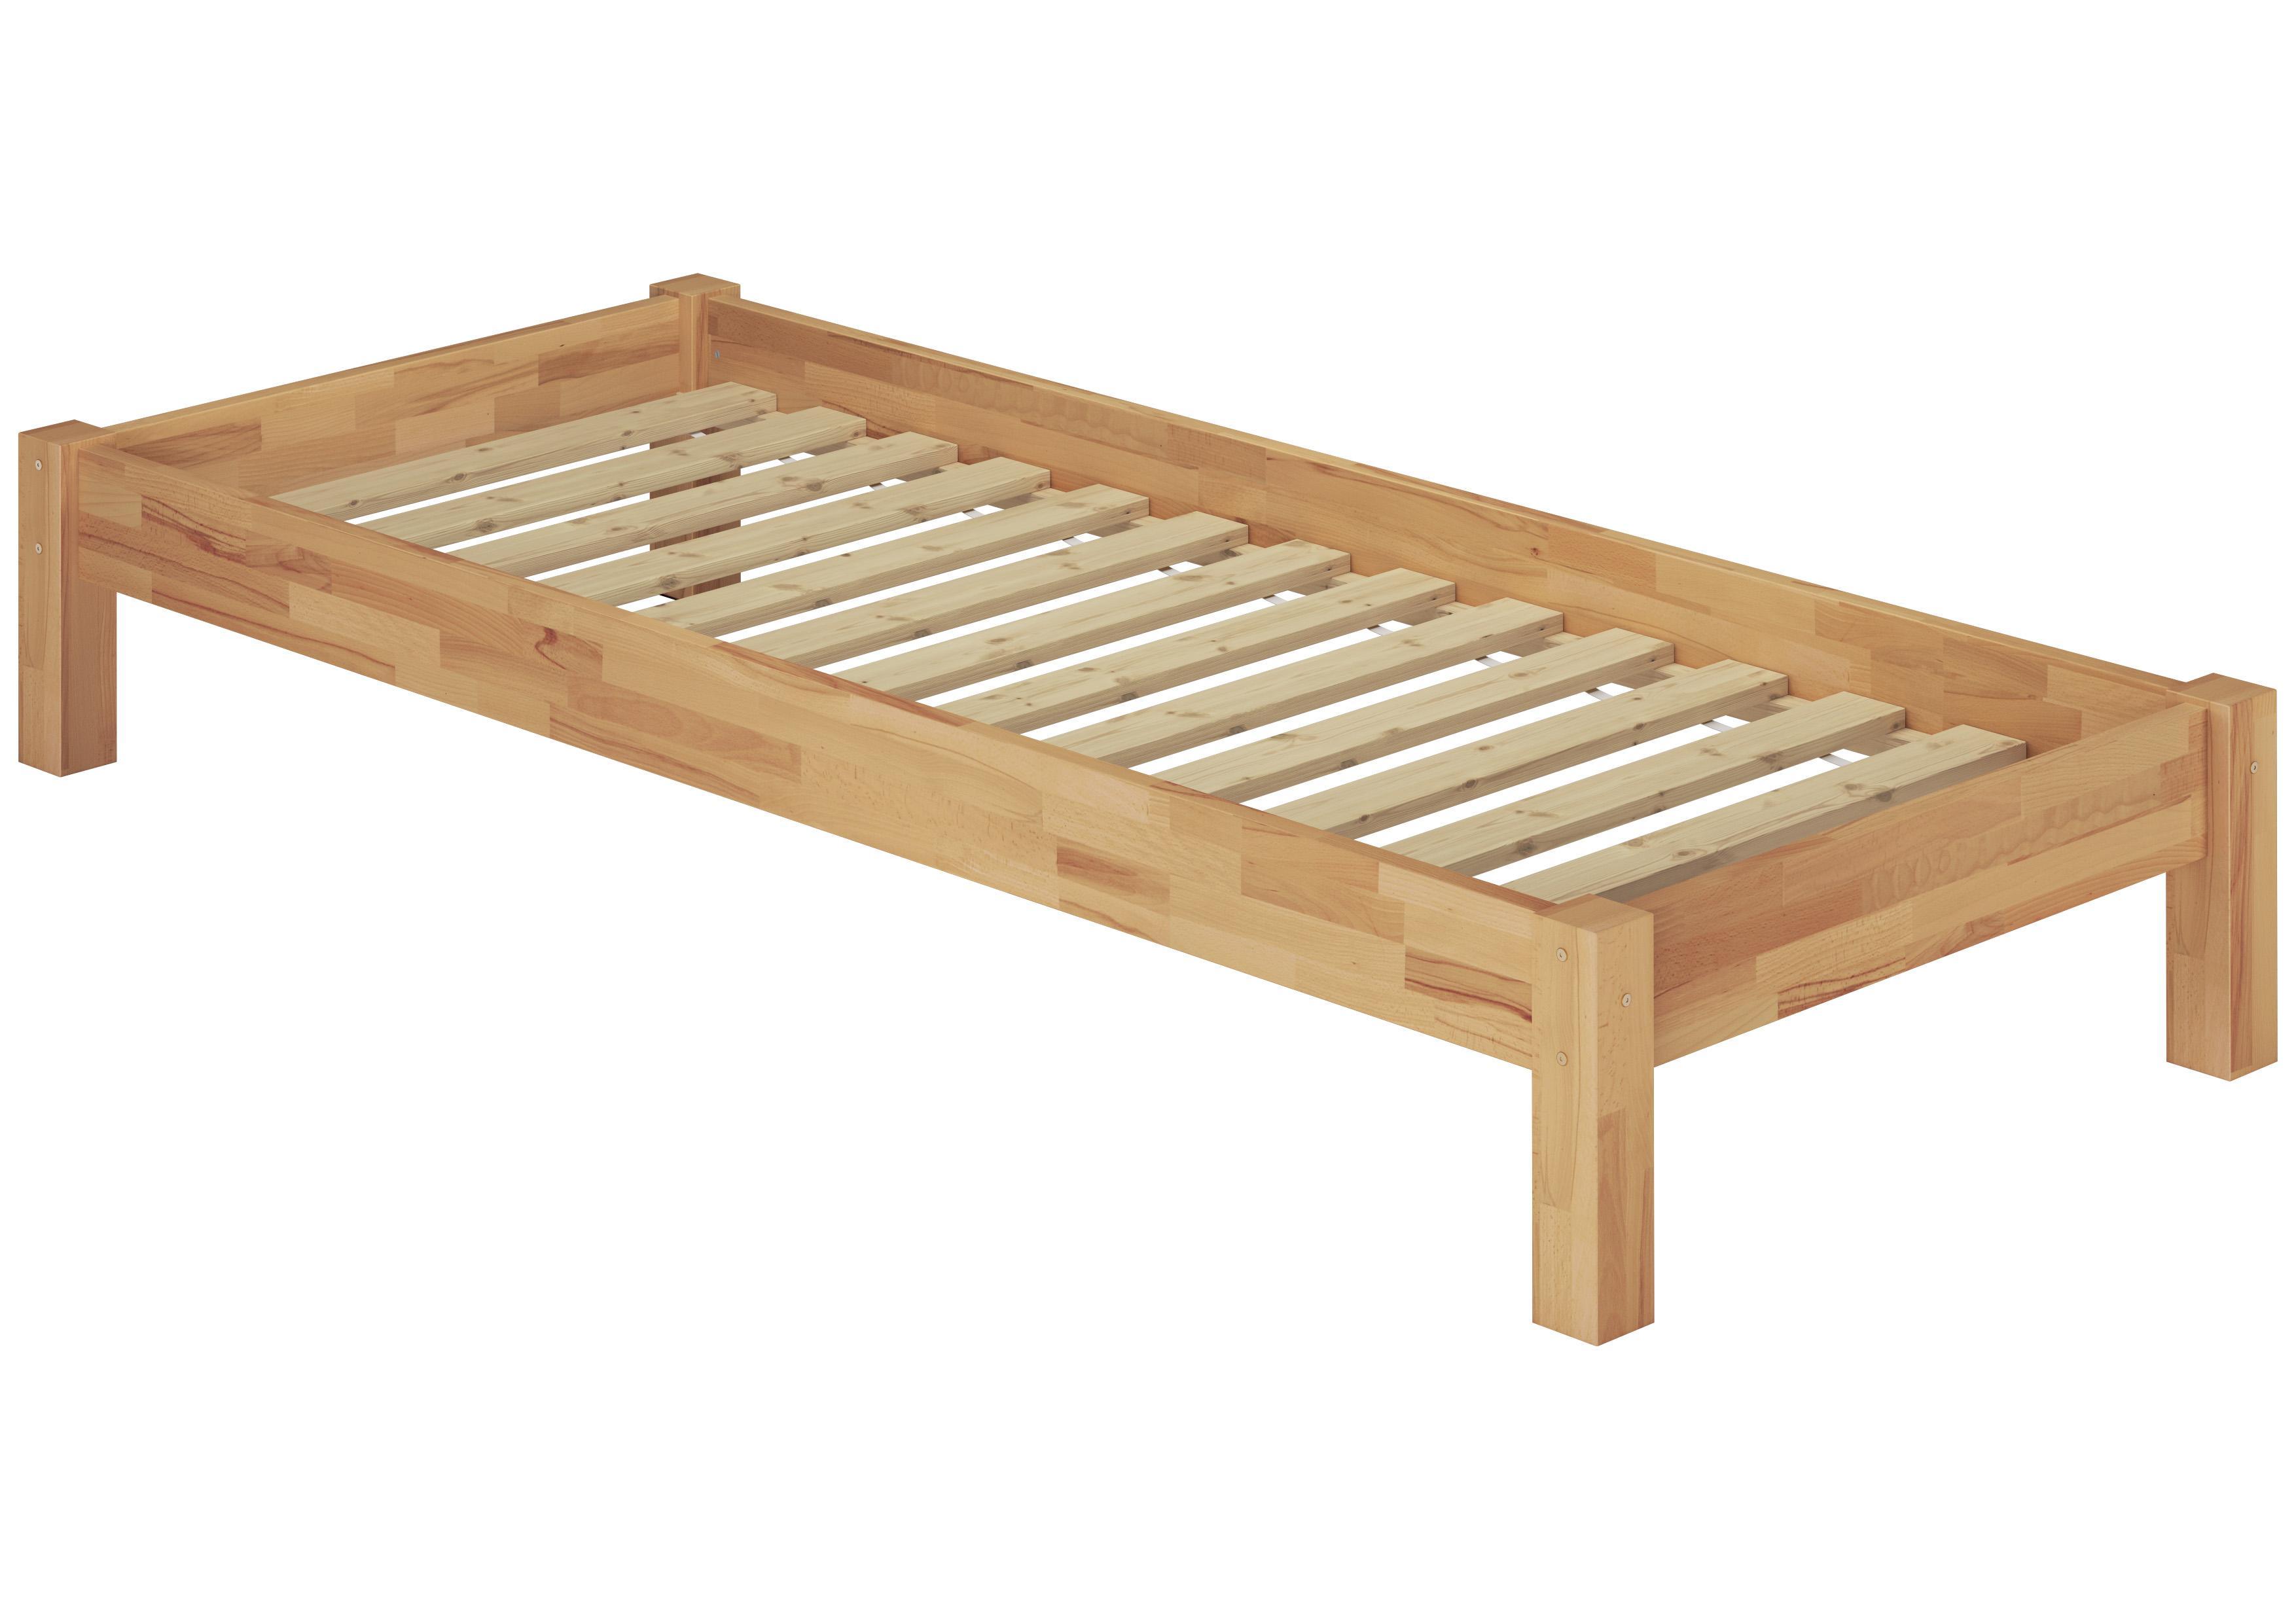 Erst-Holz® Buche-Bett Futonbett Einzelbett 90x200 Massivholzbett ...